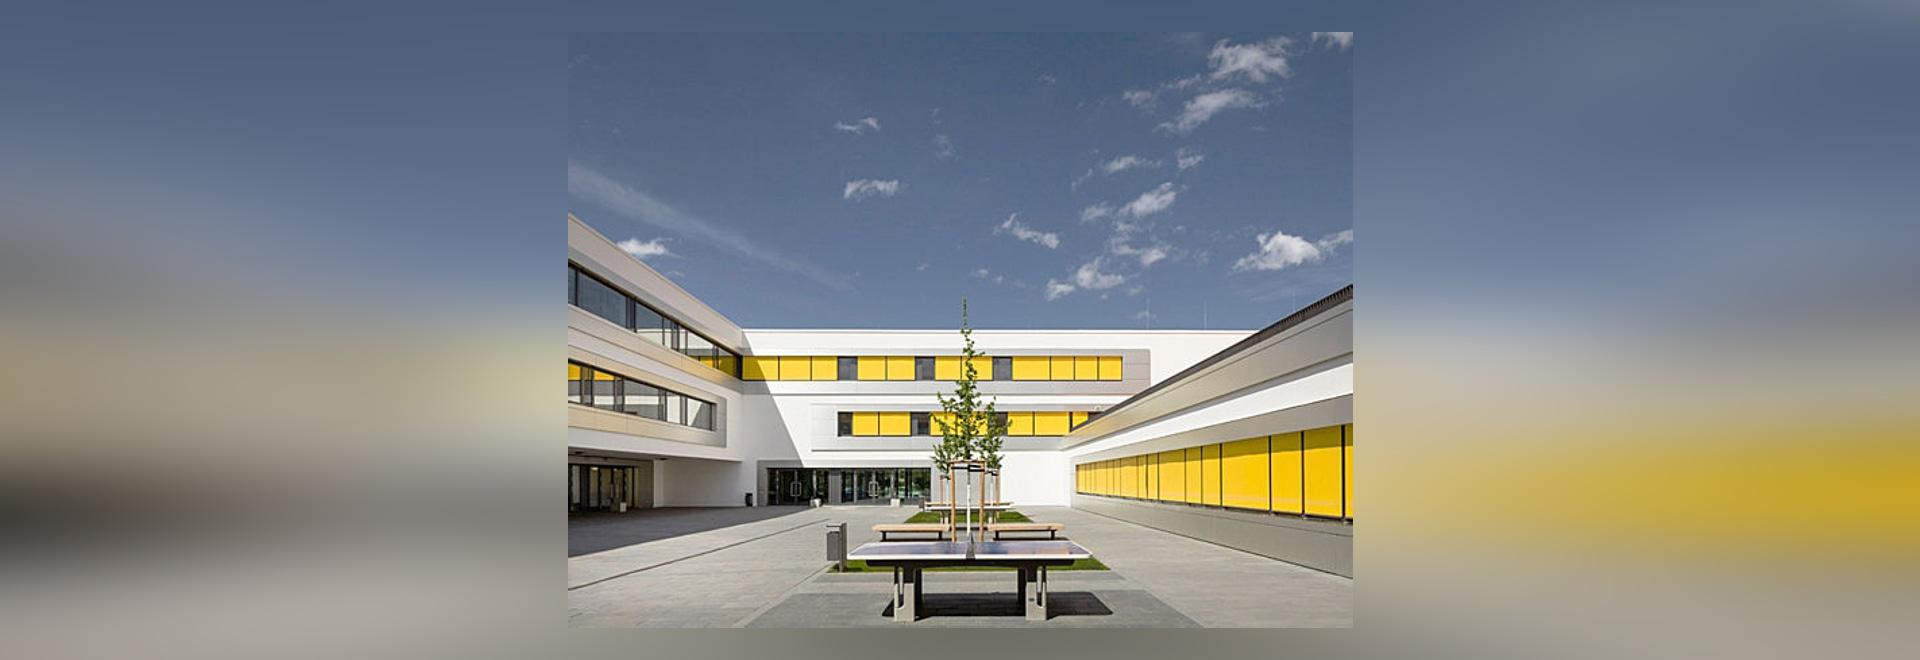 3. Schule Leipzig - Moderne Schule:  Aluminiumfassade als Beitrag zum Passivhausstandard